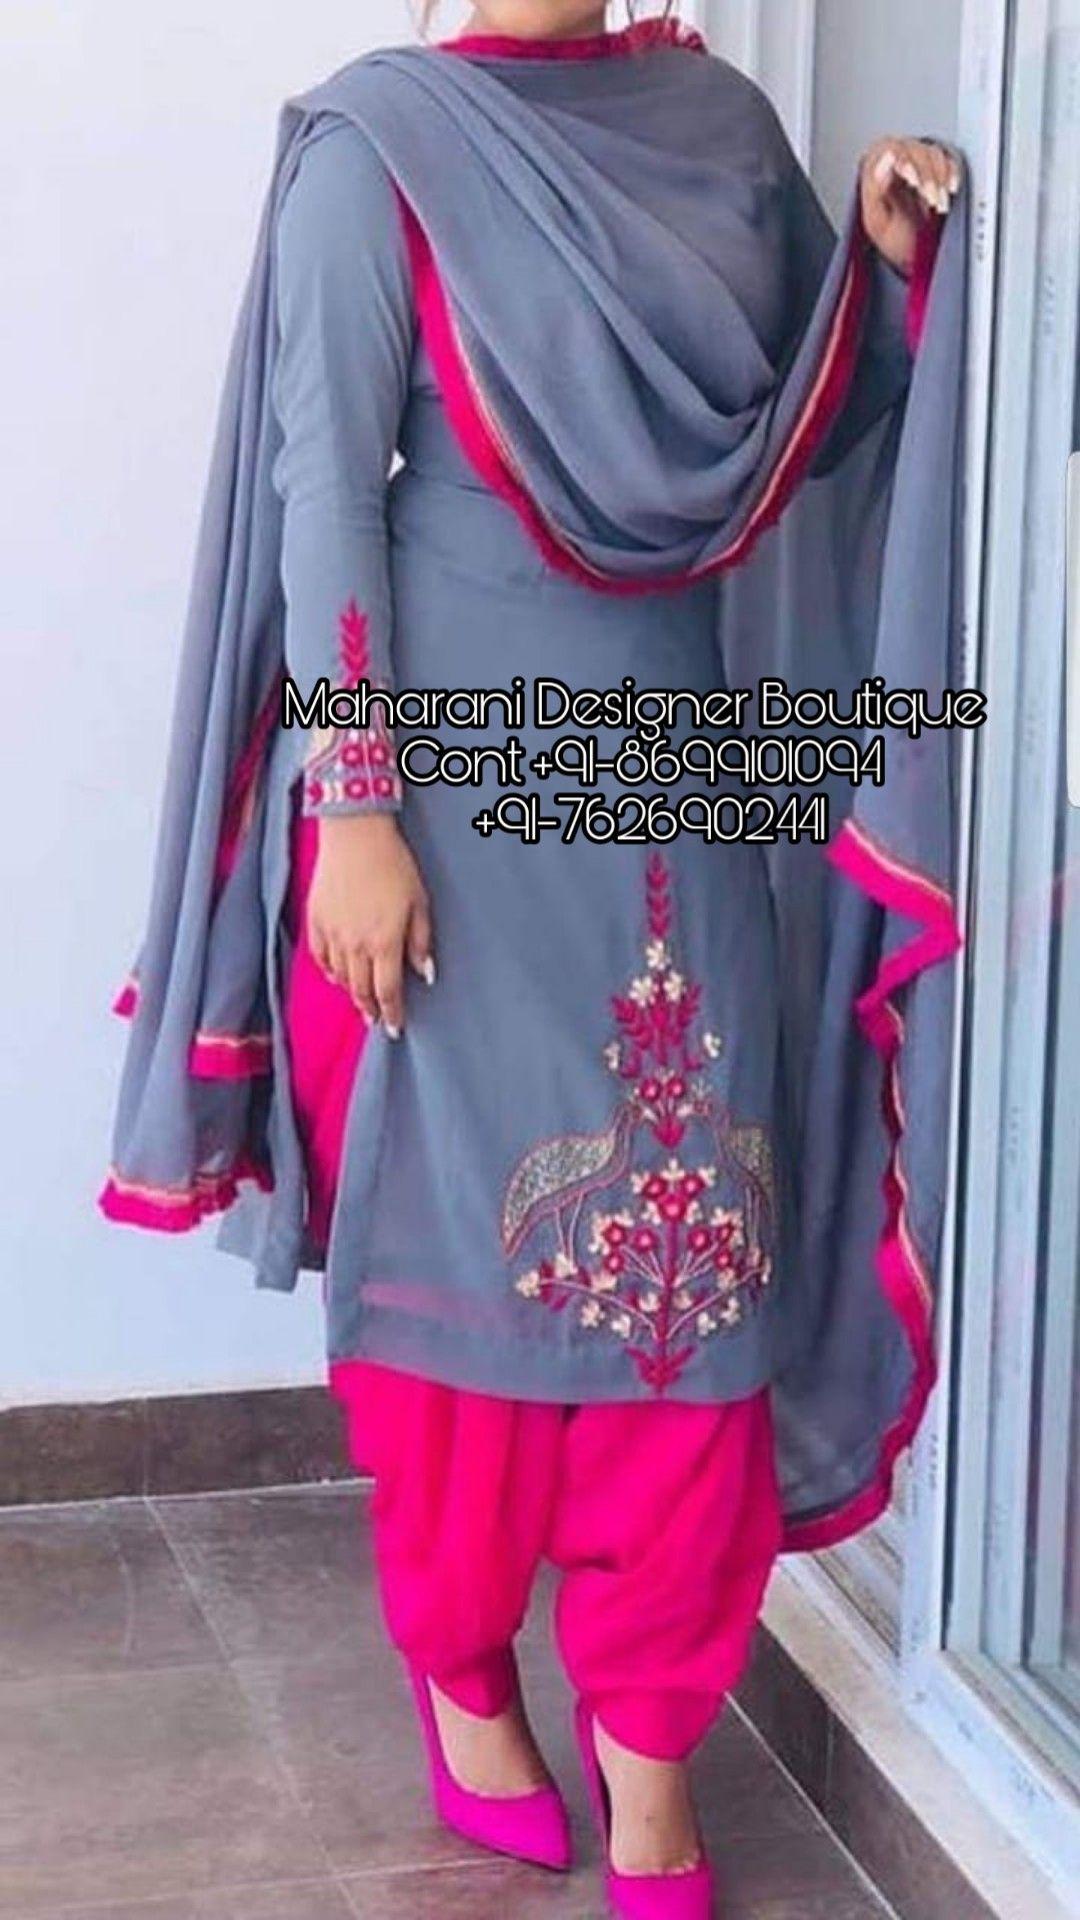 Punjabi Patiala Suits Online Shopping Maharani Designer Boutique Patiala Suit Punjabi Suit Boutique Patiala Suit Designs